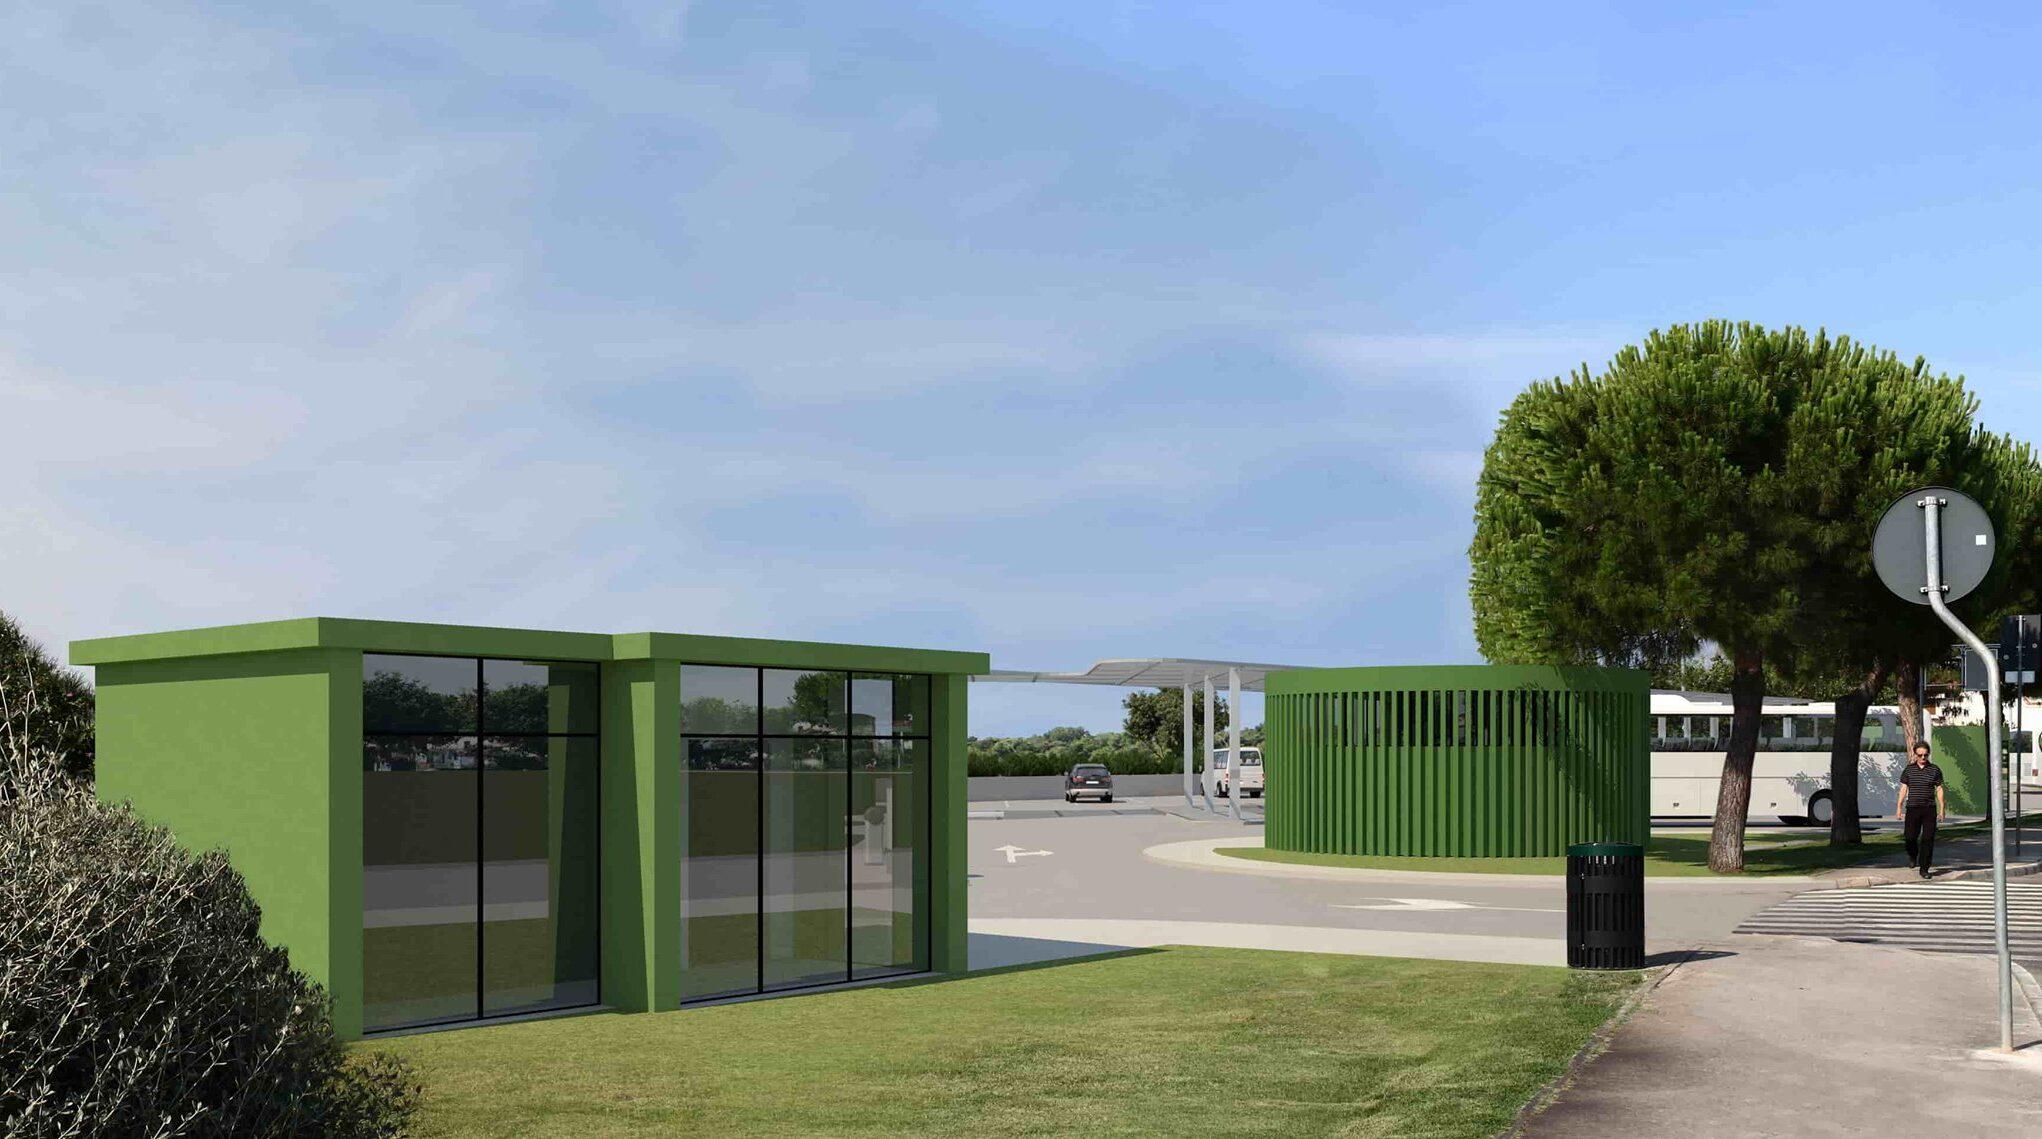 Izdana građevinska dozvola za projekt novog autobusnog kolodvora